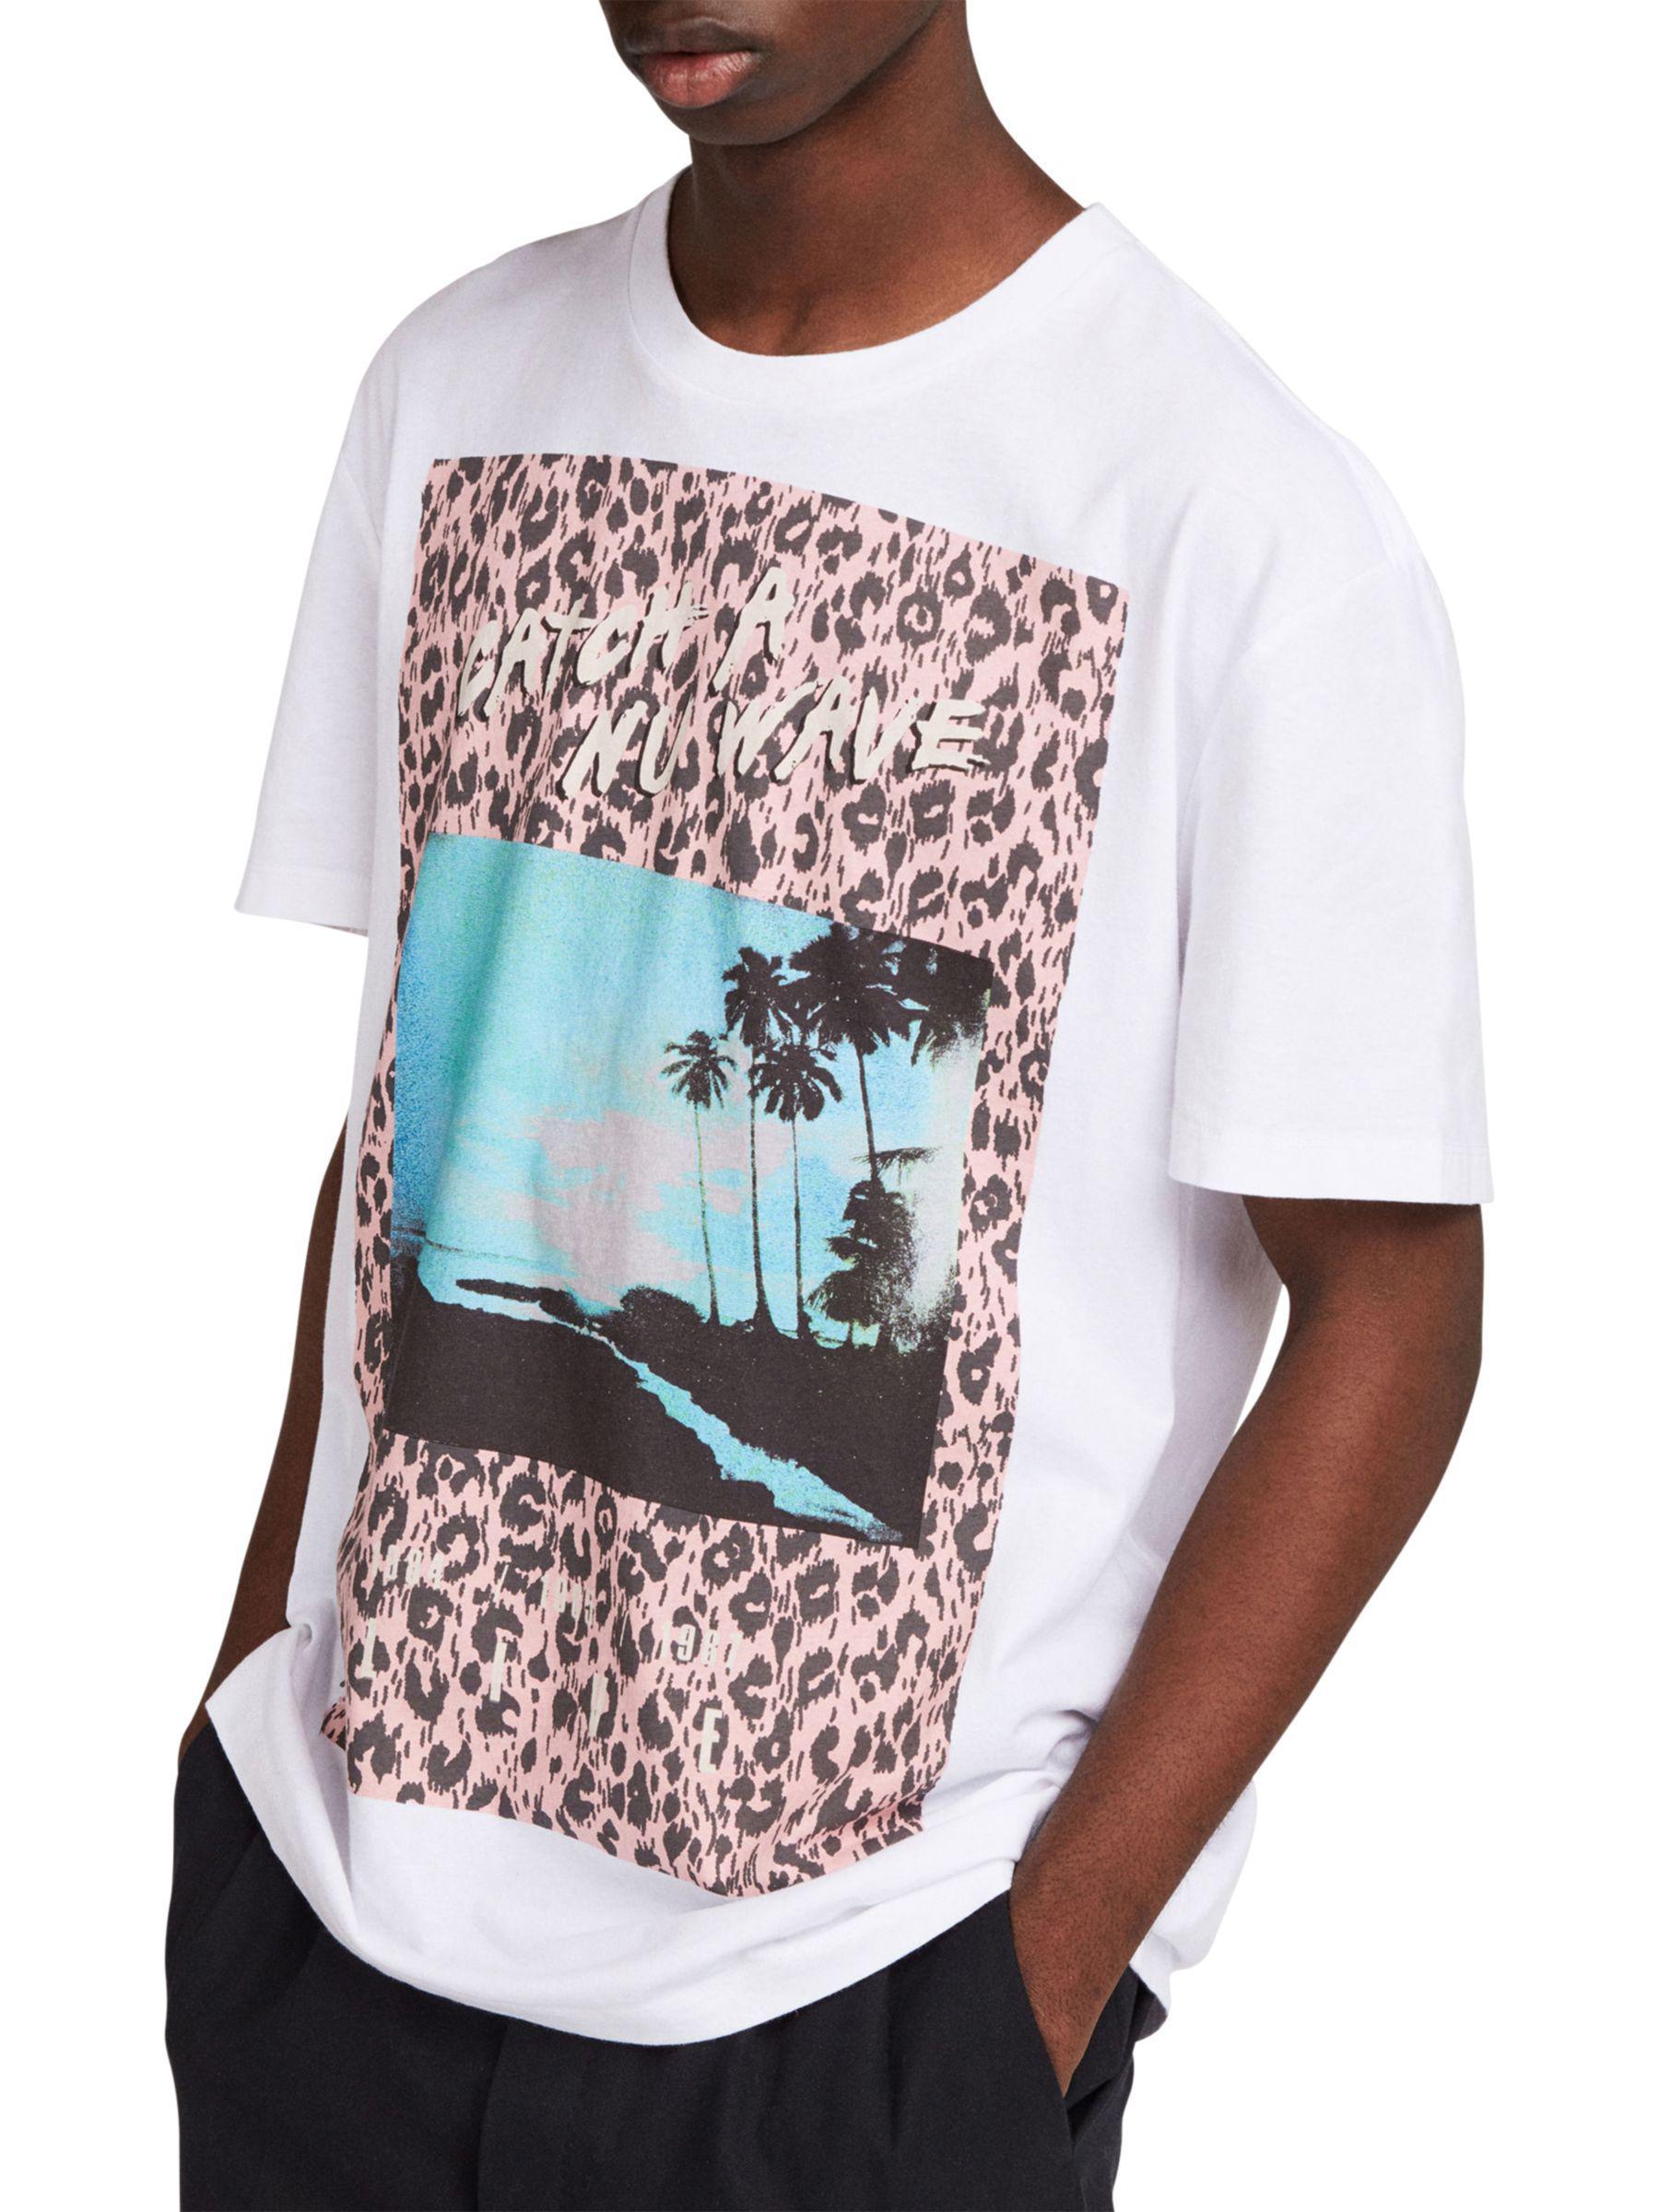 d6aa4dd83 AllSaints Horizon Graphic Print T-shirt in White for Men - Lyst